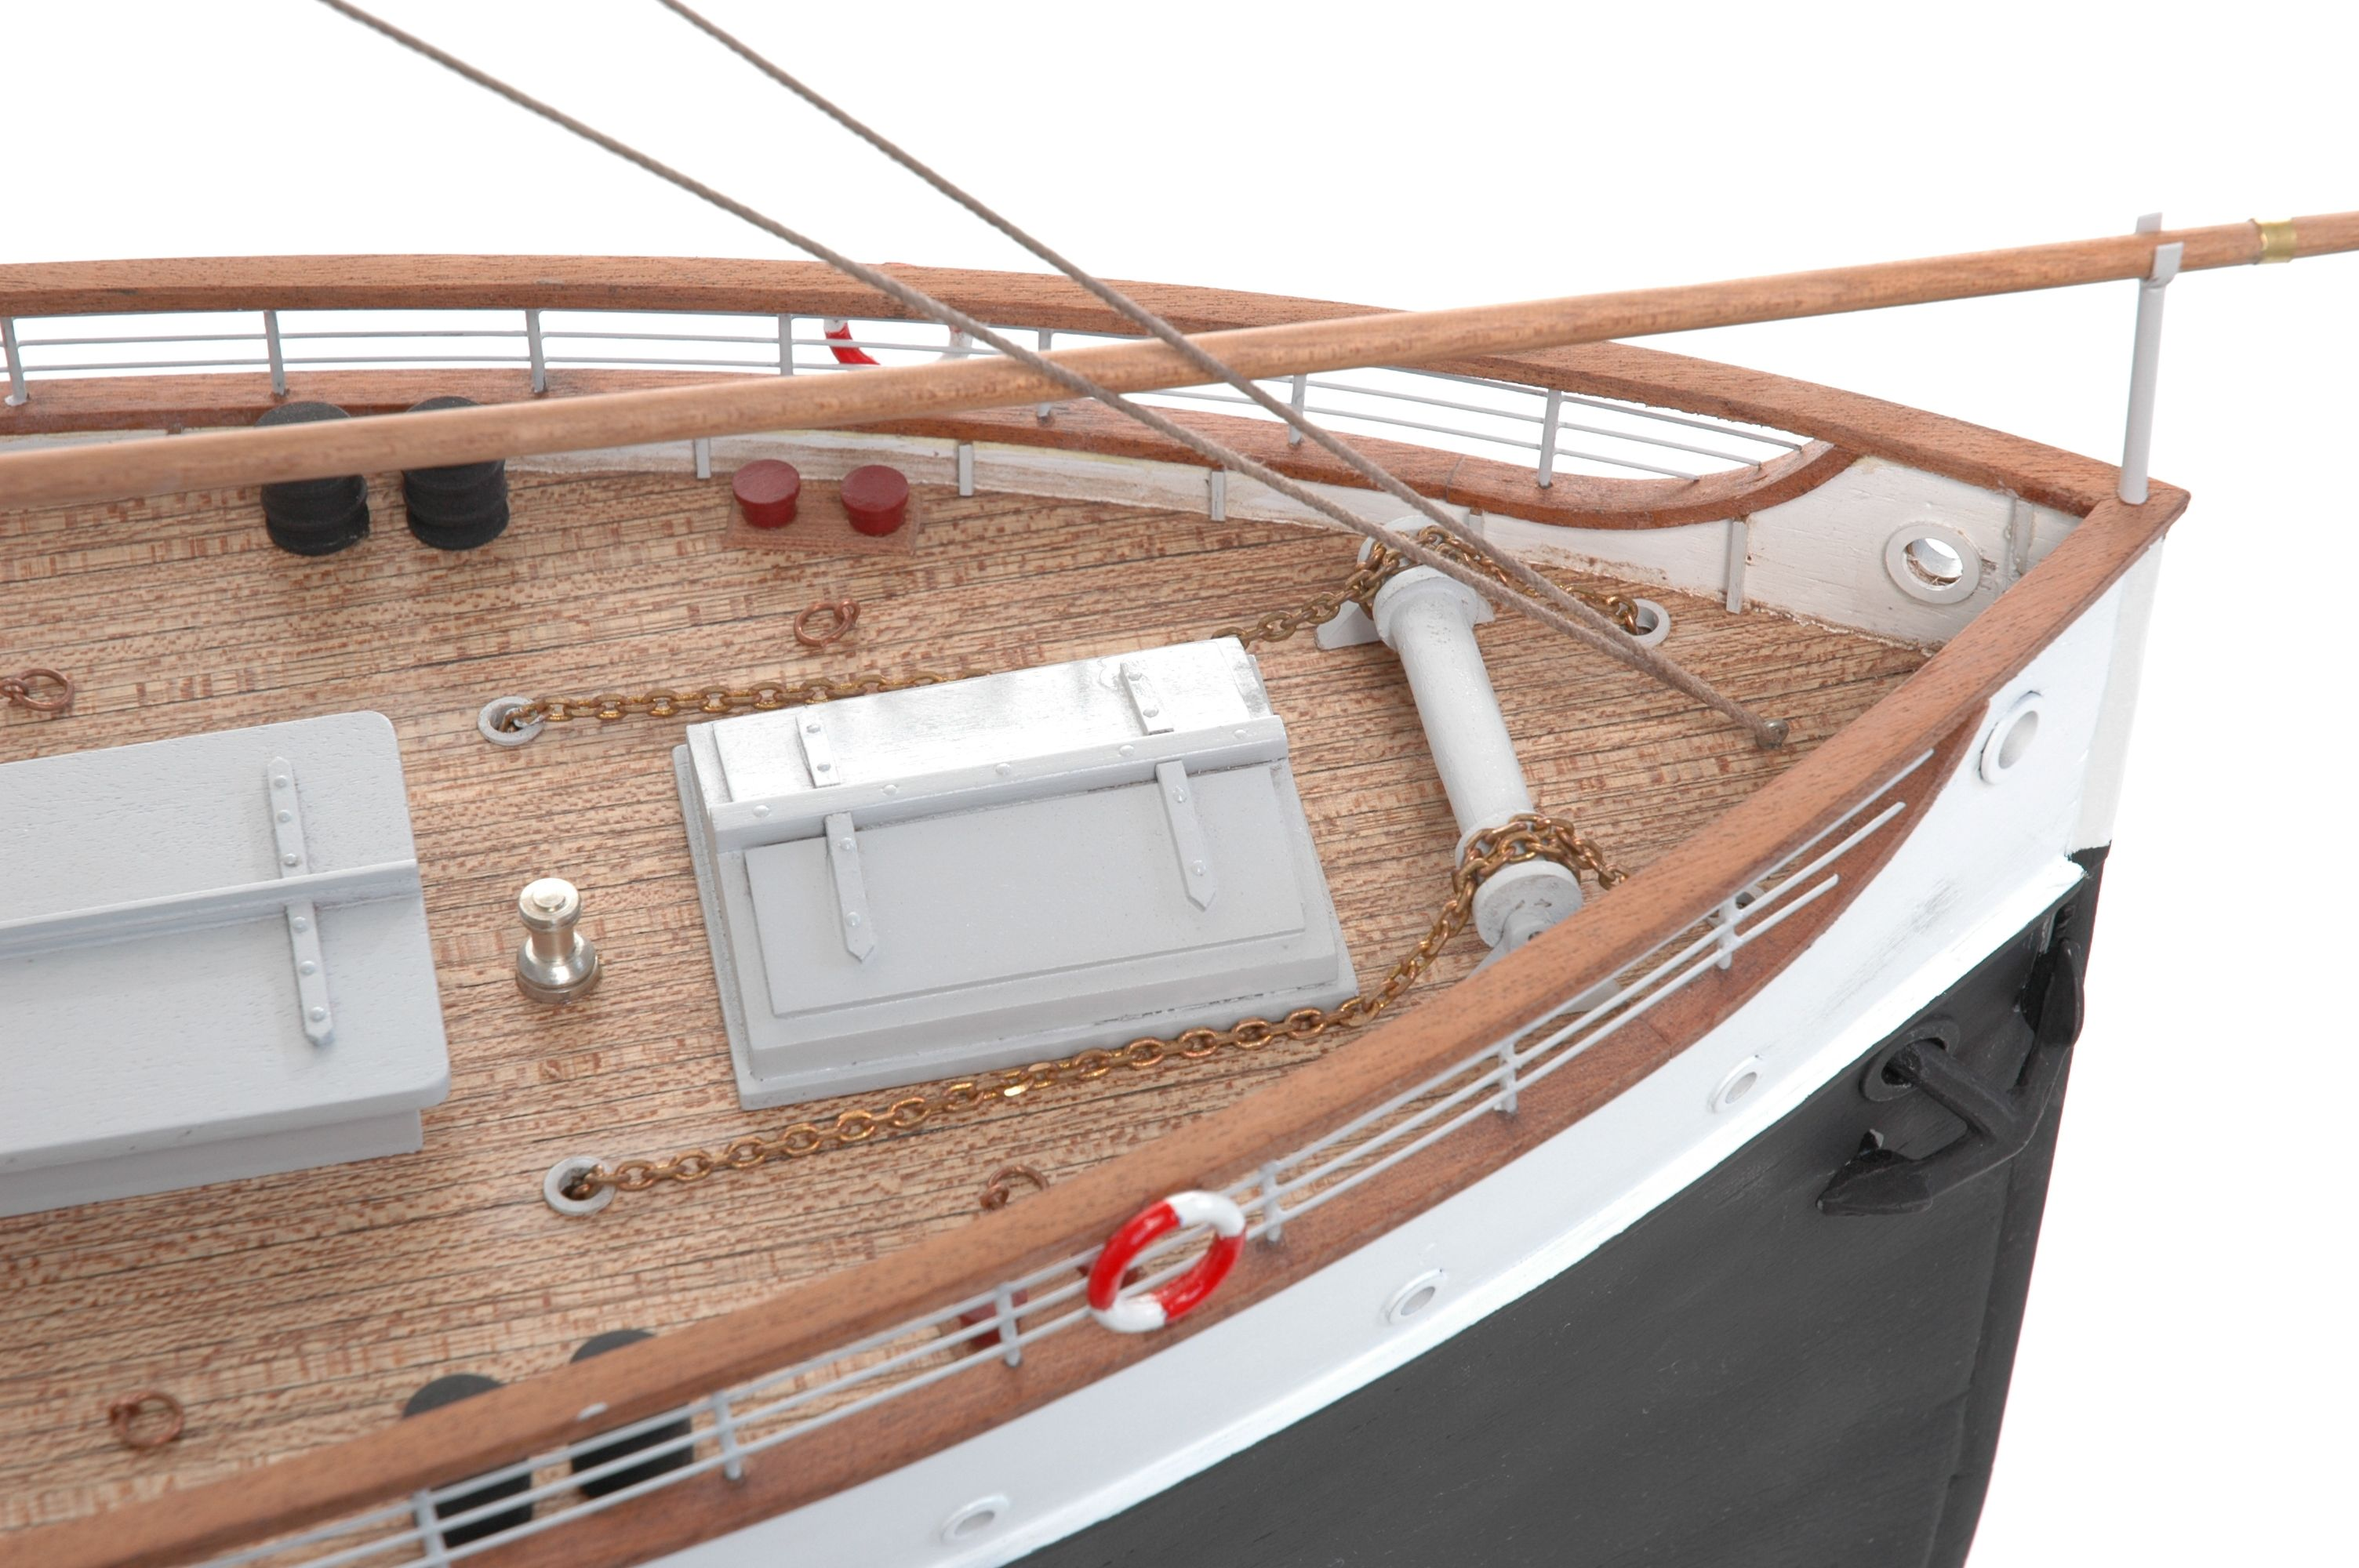 1416-6312-G-G-Loudon-Ship-Model-large-Premier-Range